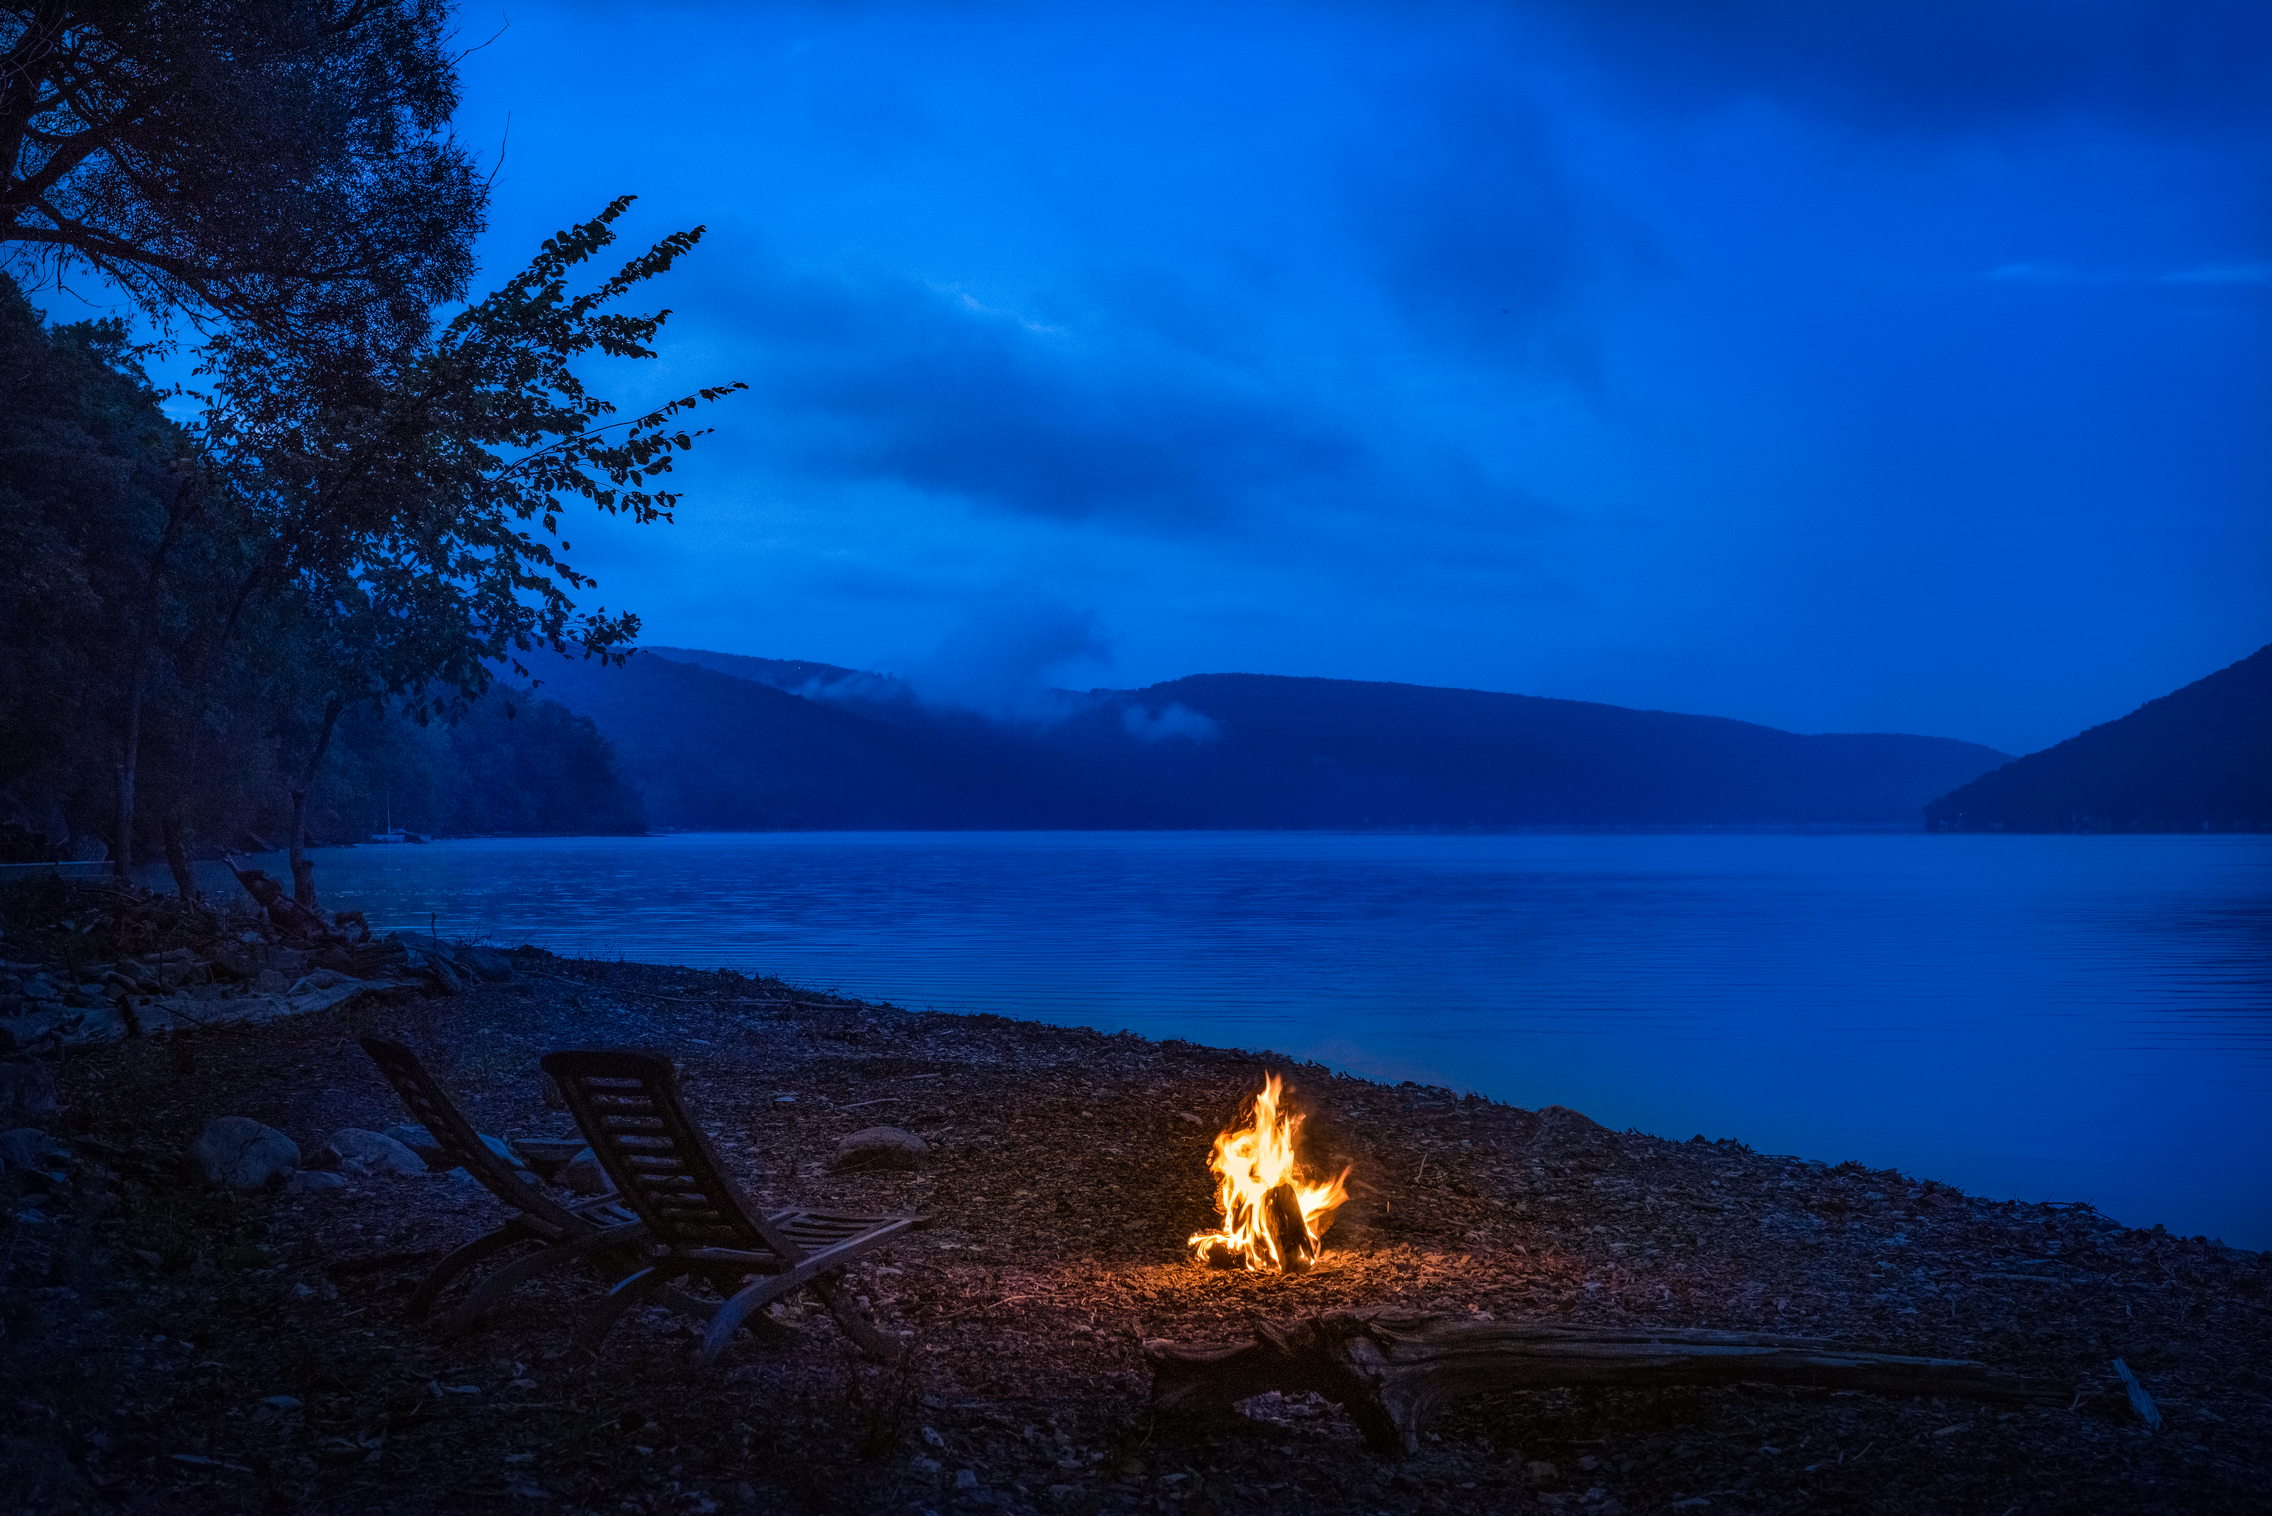 42 Camp Longhorn, 974 Ten Mile Point, Skaneateles, NY 13152, For Sale Michael DeRosa listings.JPG